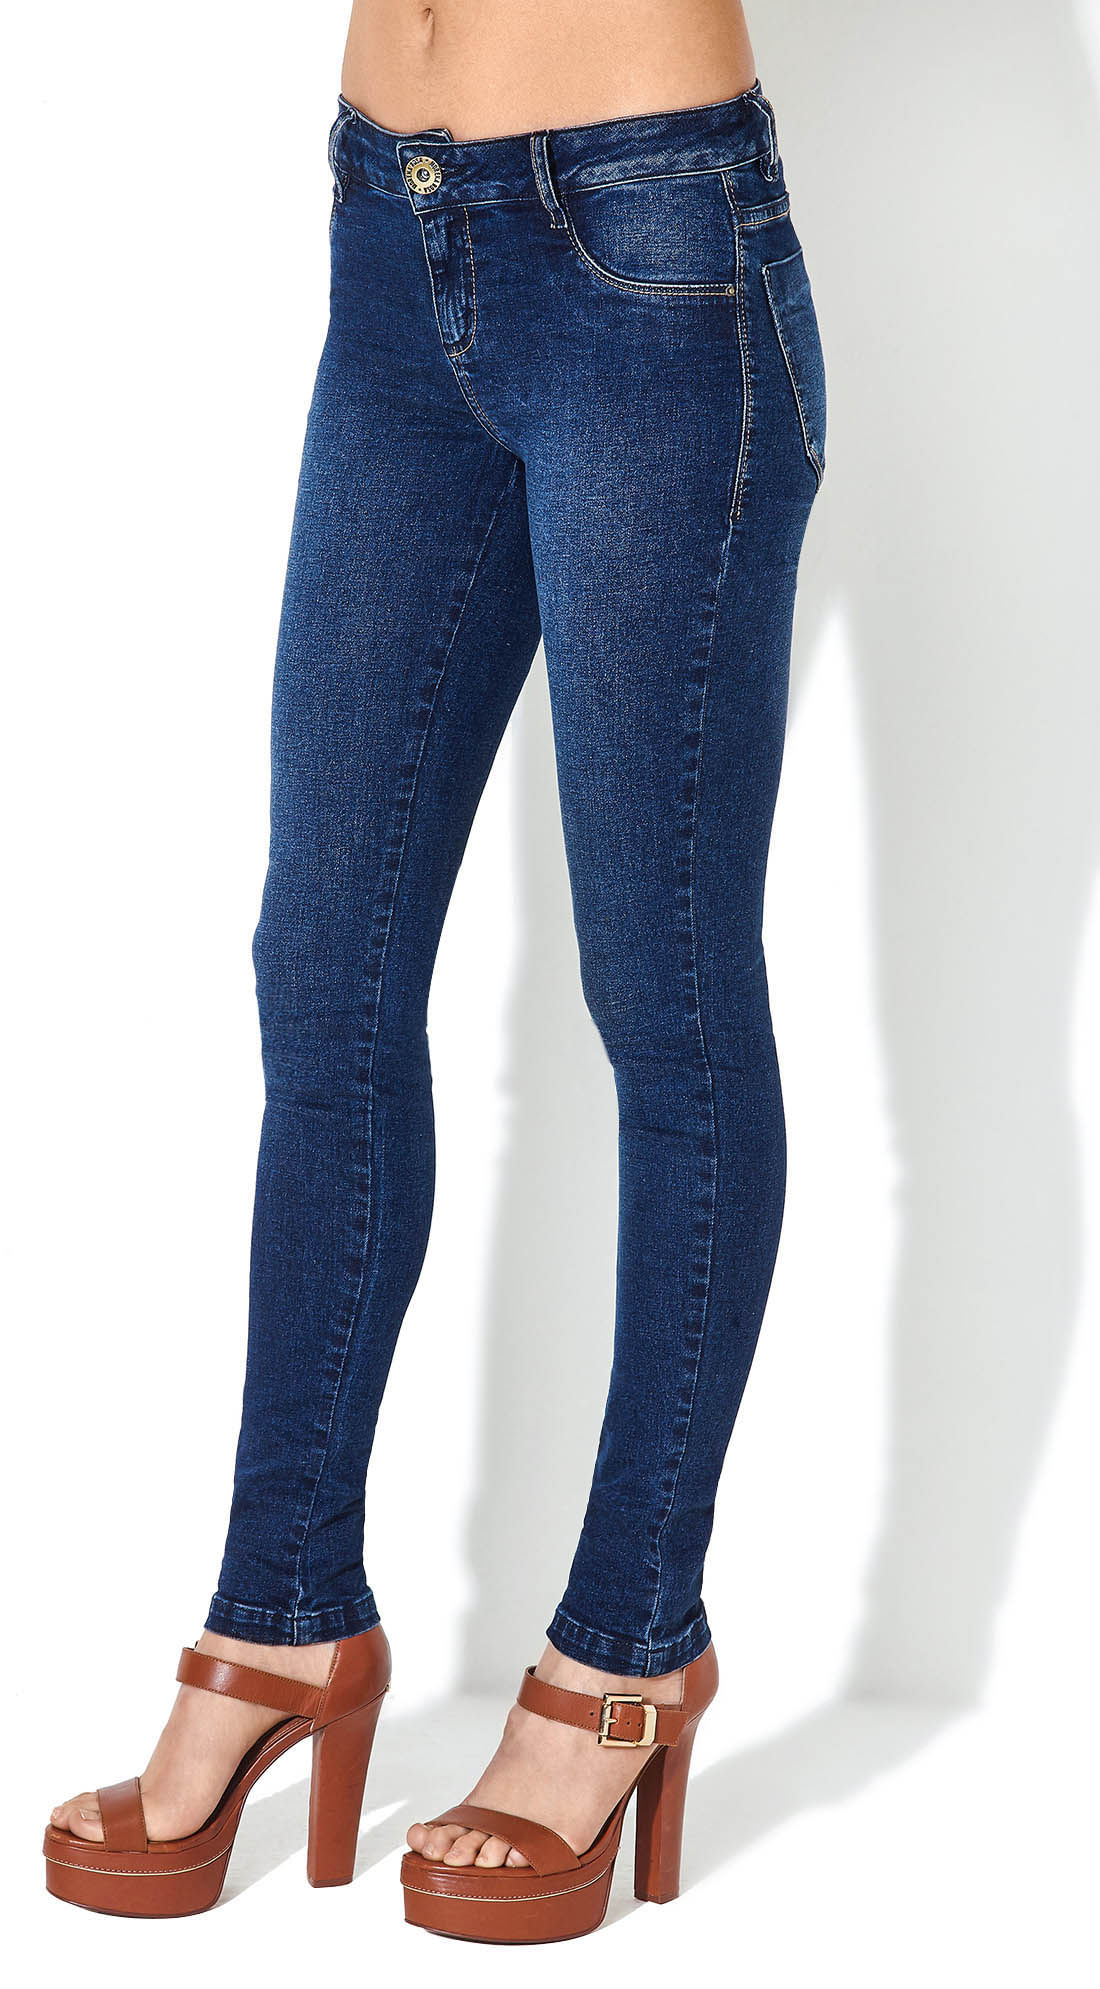 332cf66fe7 Calca Jeans Isabelli Cos Baixo Basica Jeans - morenarosa